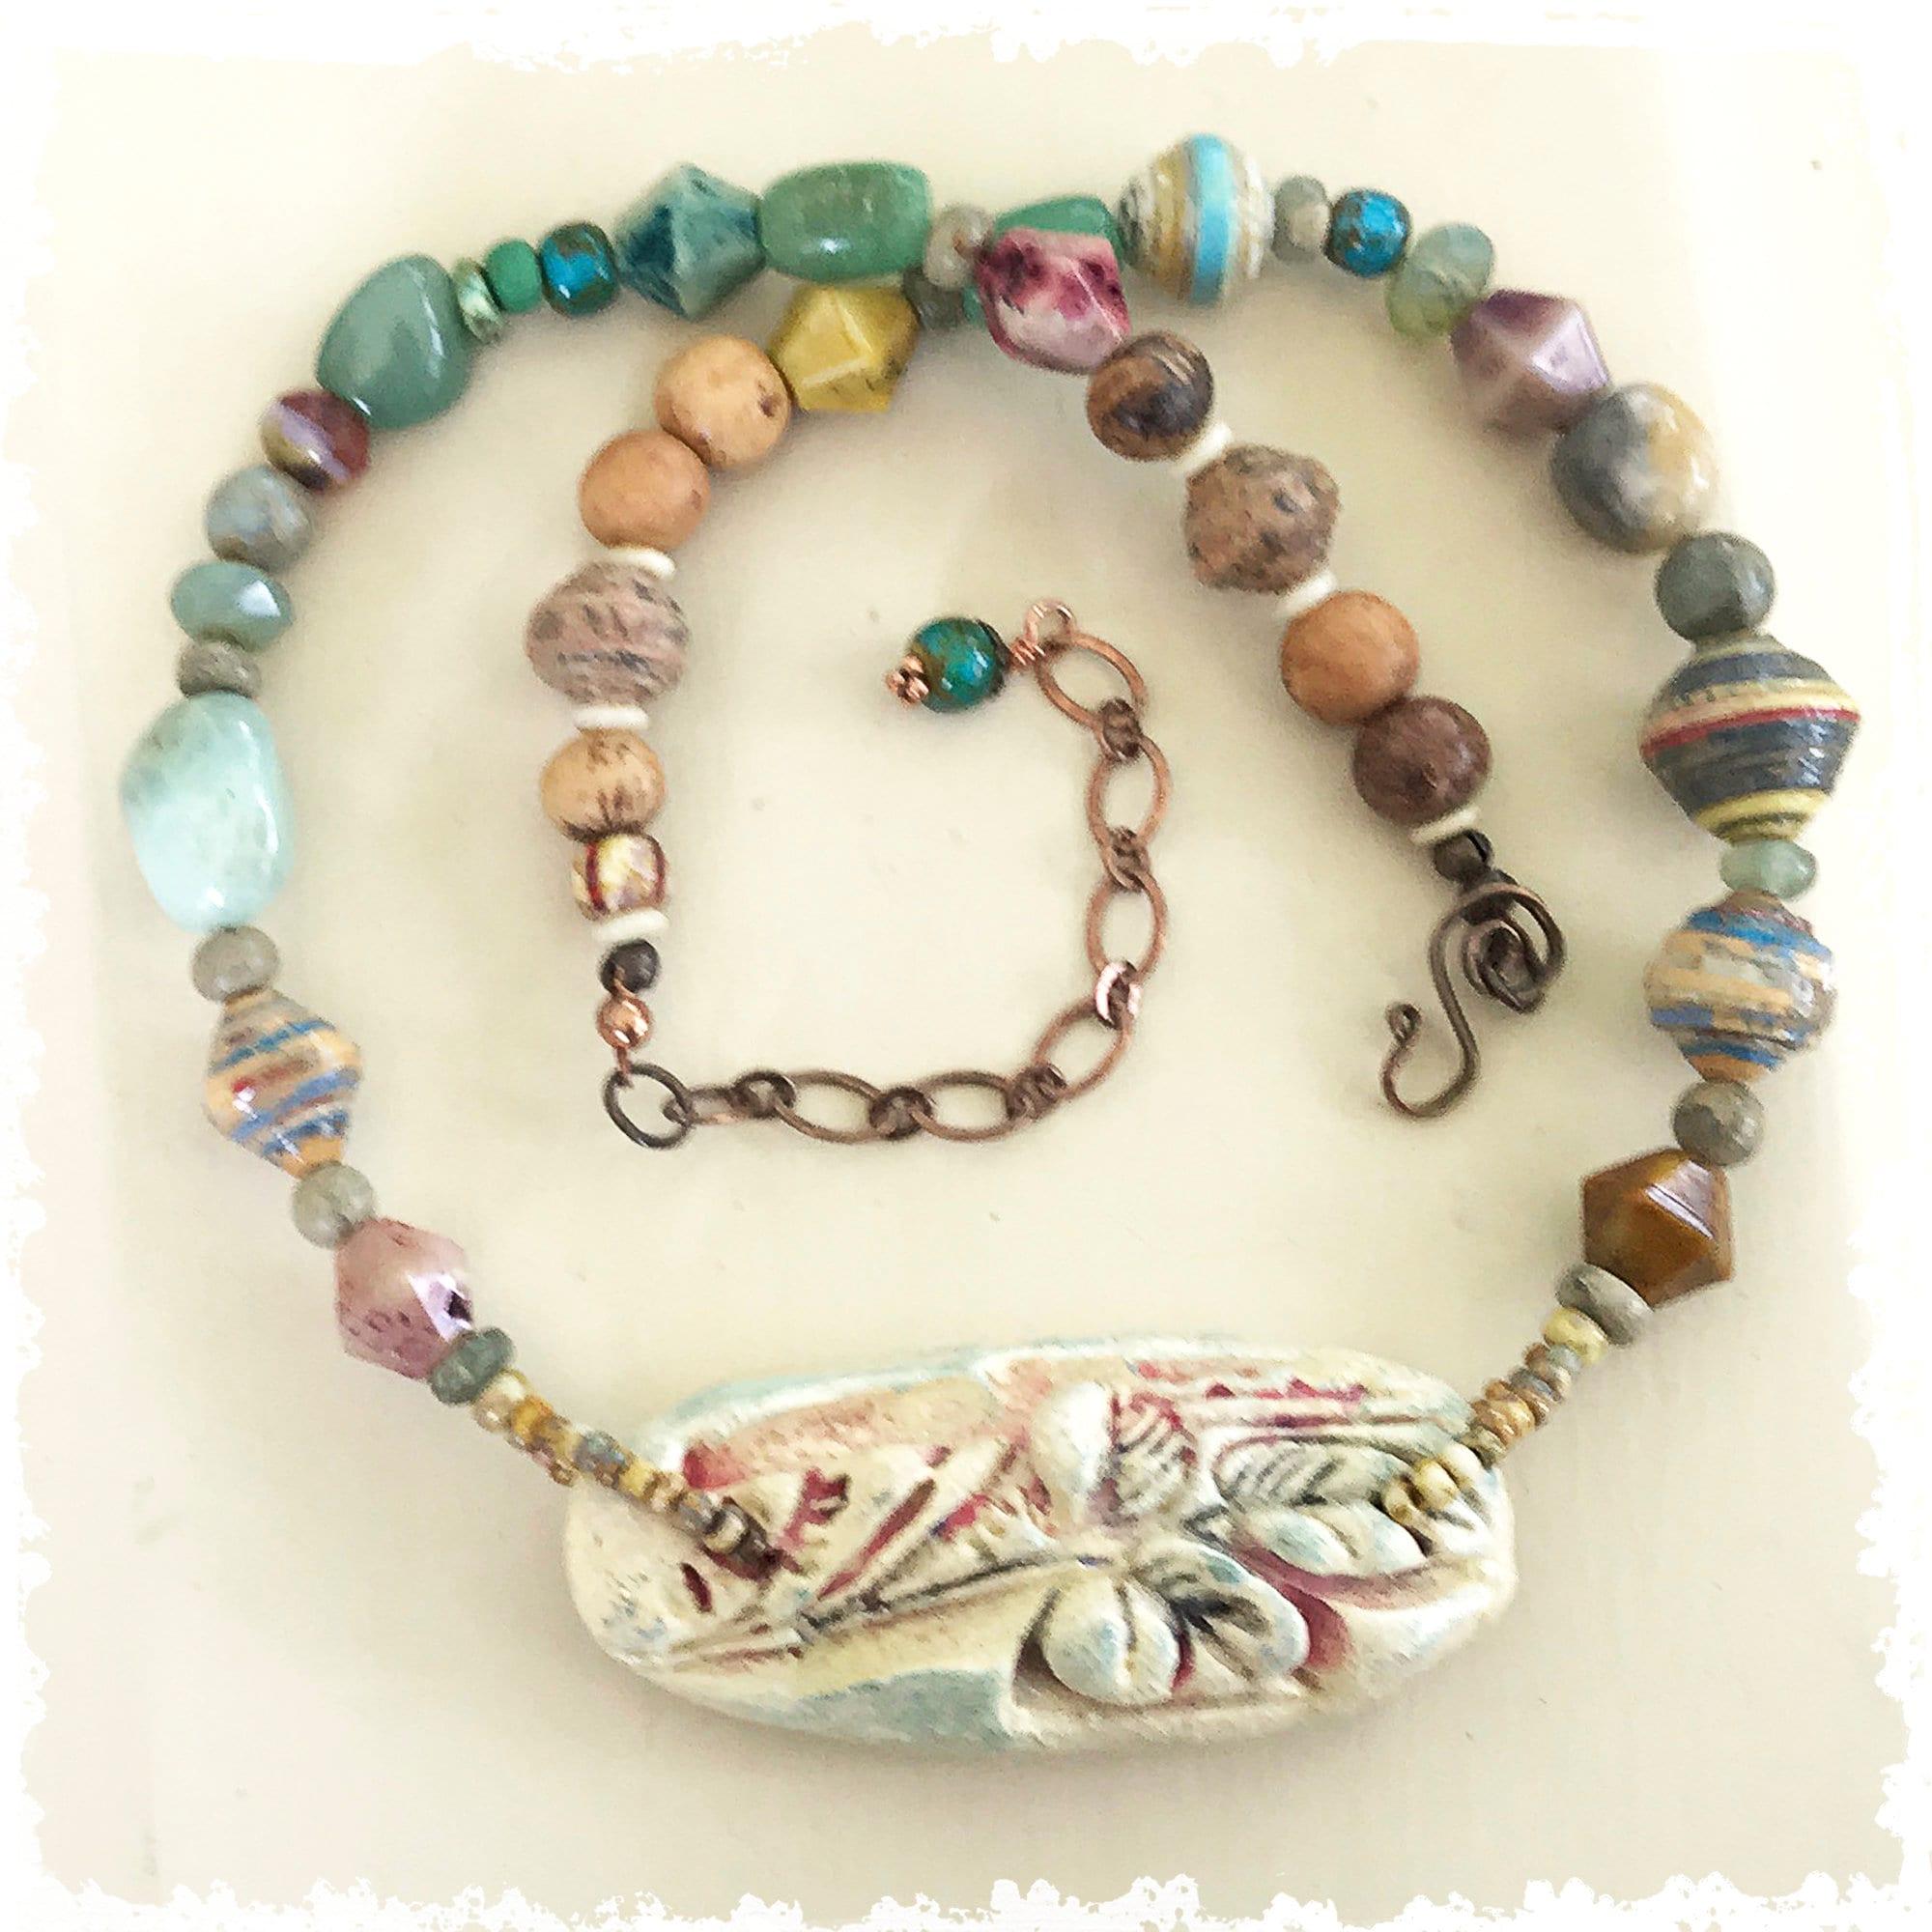 Colorful Multi Strand Boho Bracelet Bohemian OOAK Bracelet Handmade Chunky Bracelet Mixed Gemstones Earthy Colors Bead Mix